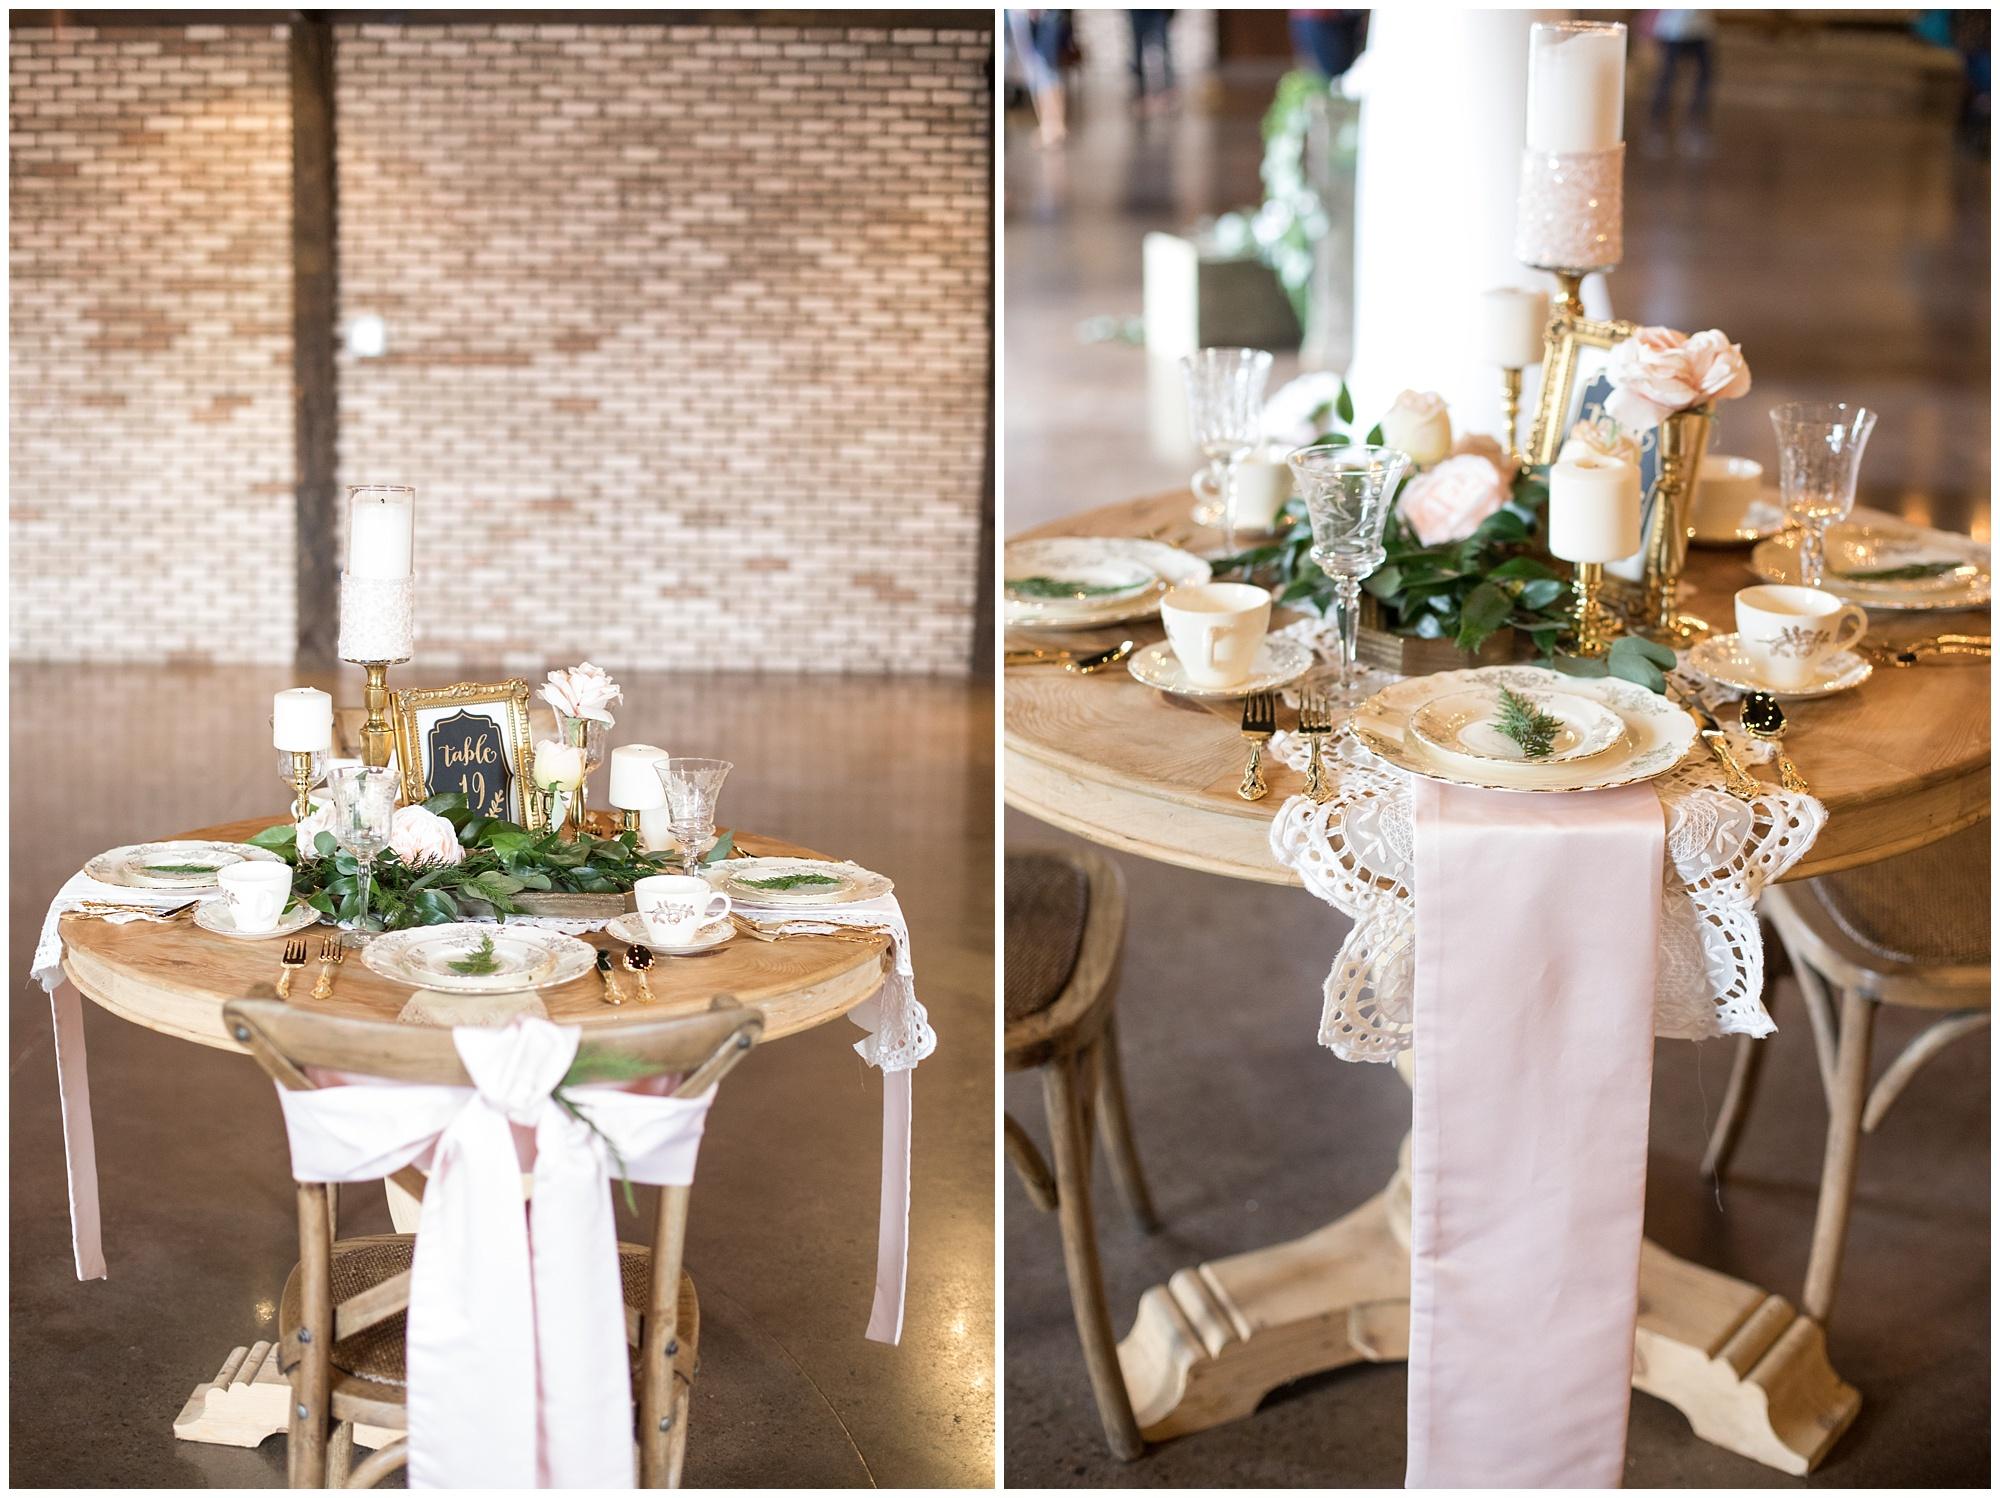 tablescape at reception